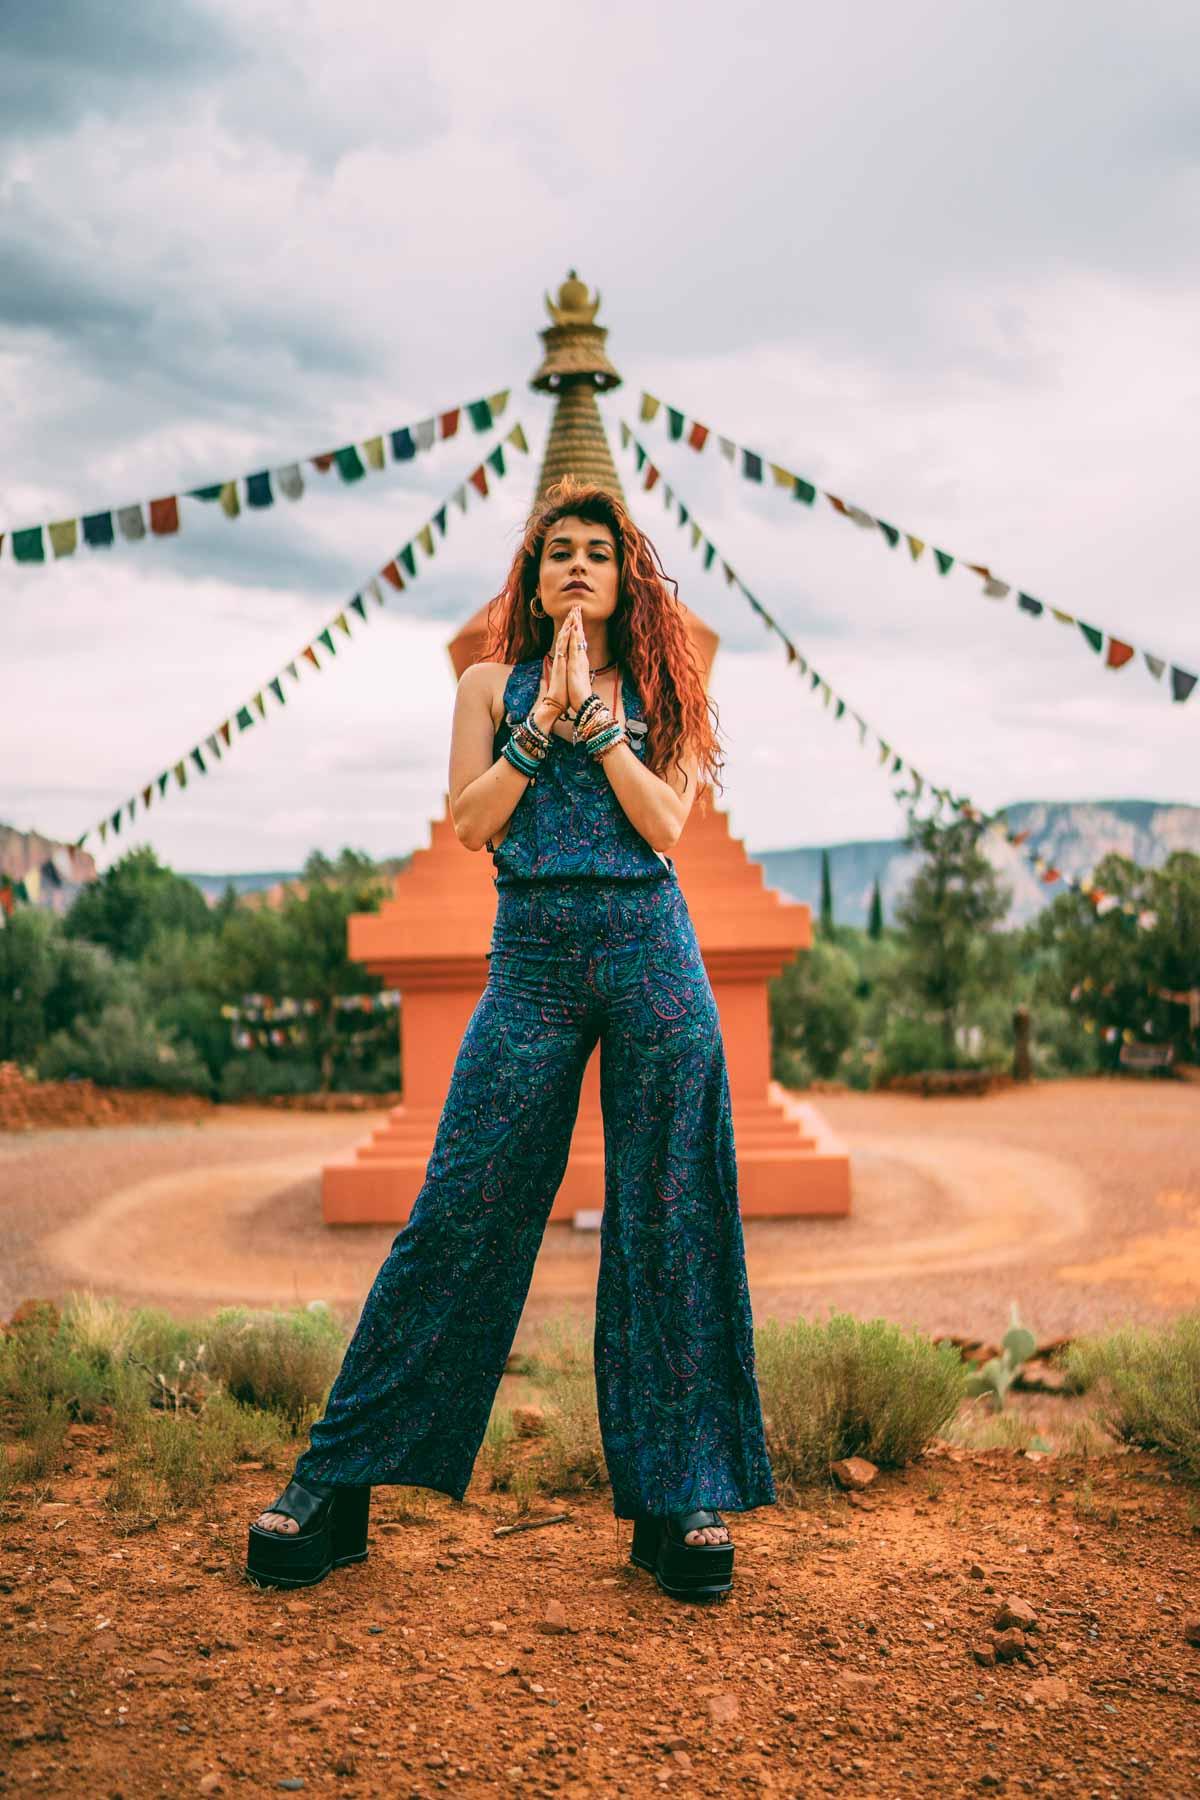 Modeled By: Tatiani De La Cruz Clothing: Eco Savage Photo by Jas Gold Jason Goldsmith